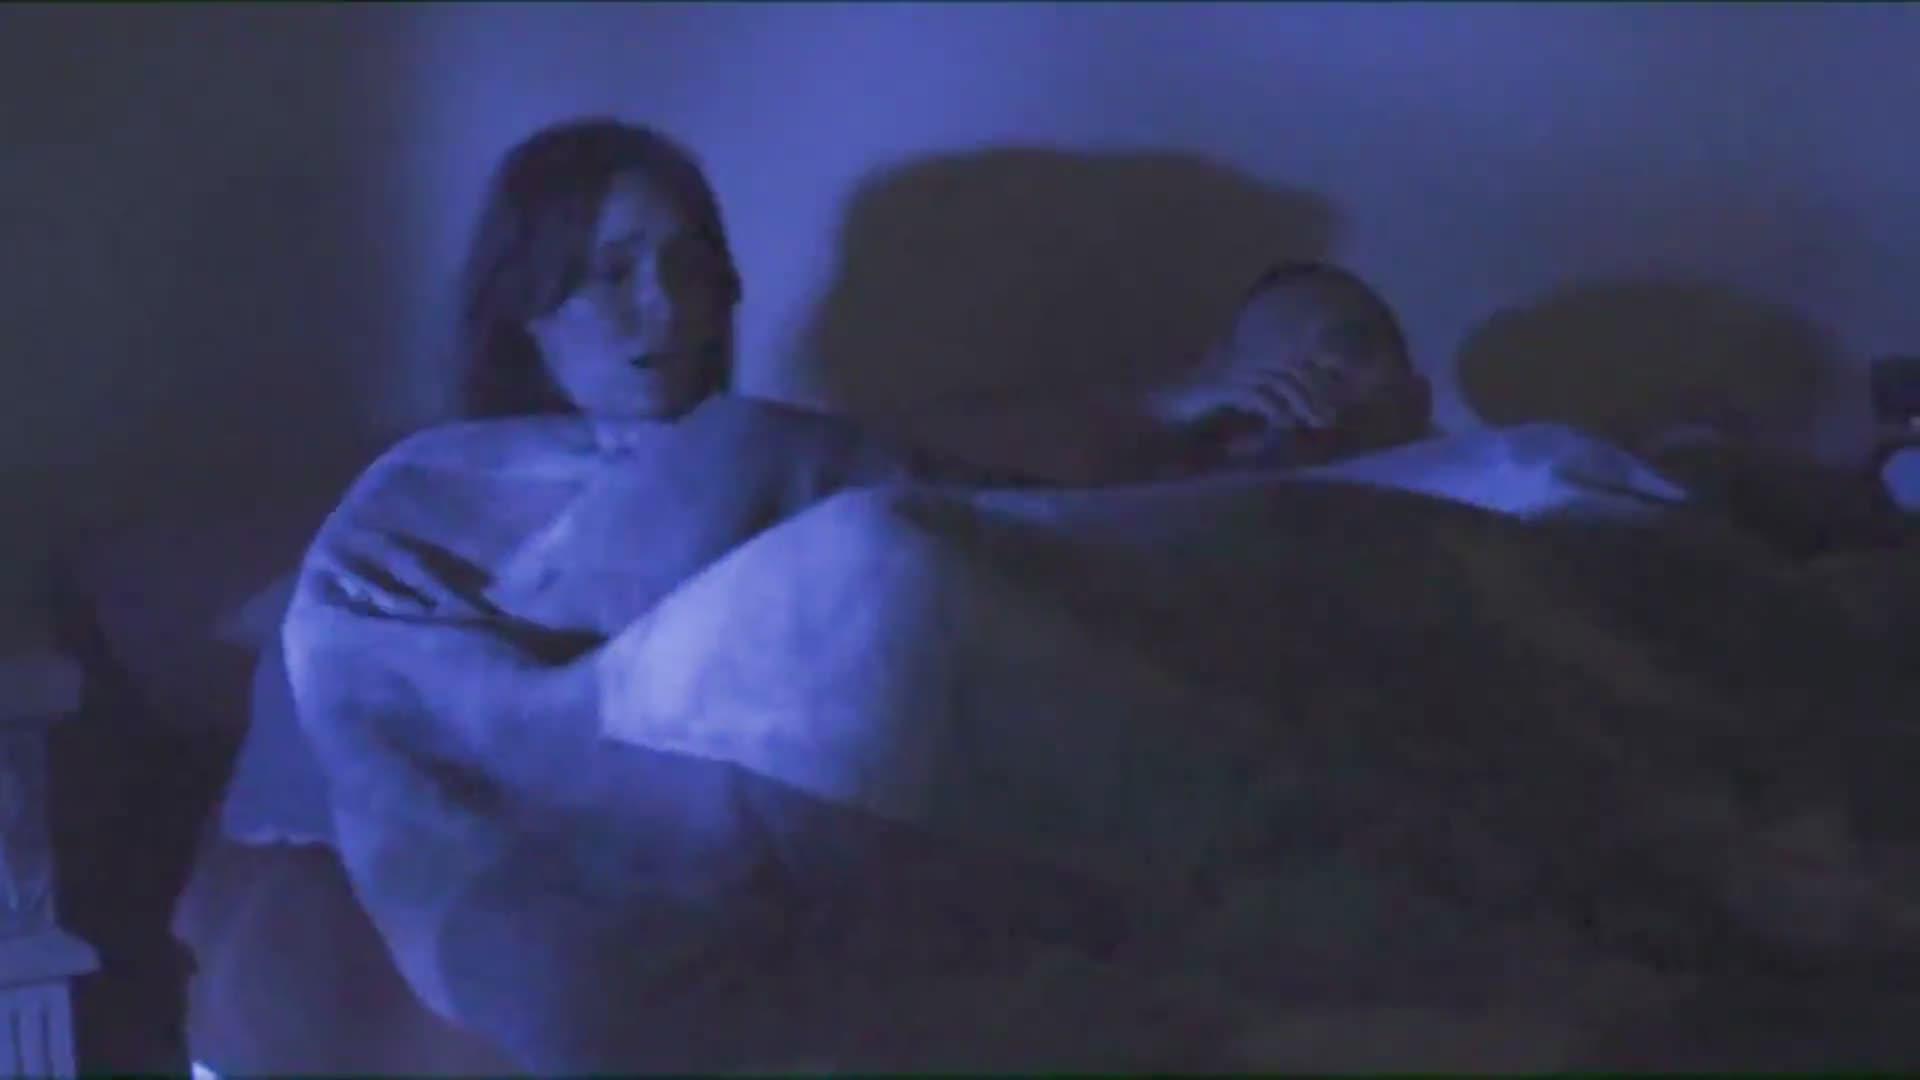 Sara Malakul Lane wakes up from nightmare scene from 12/12/12